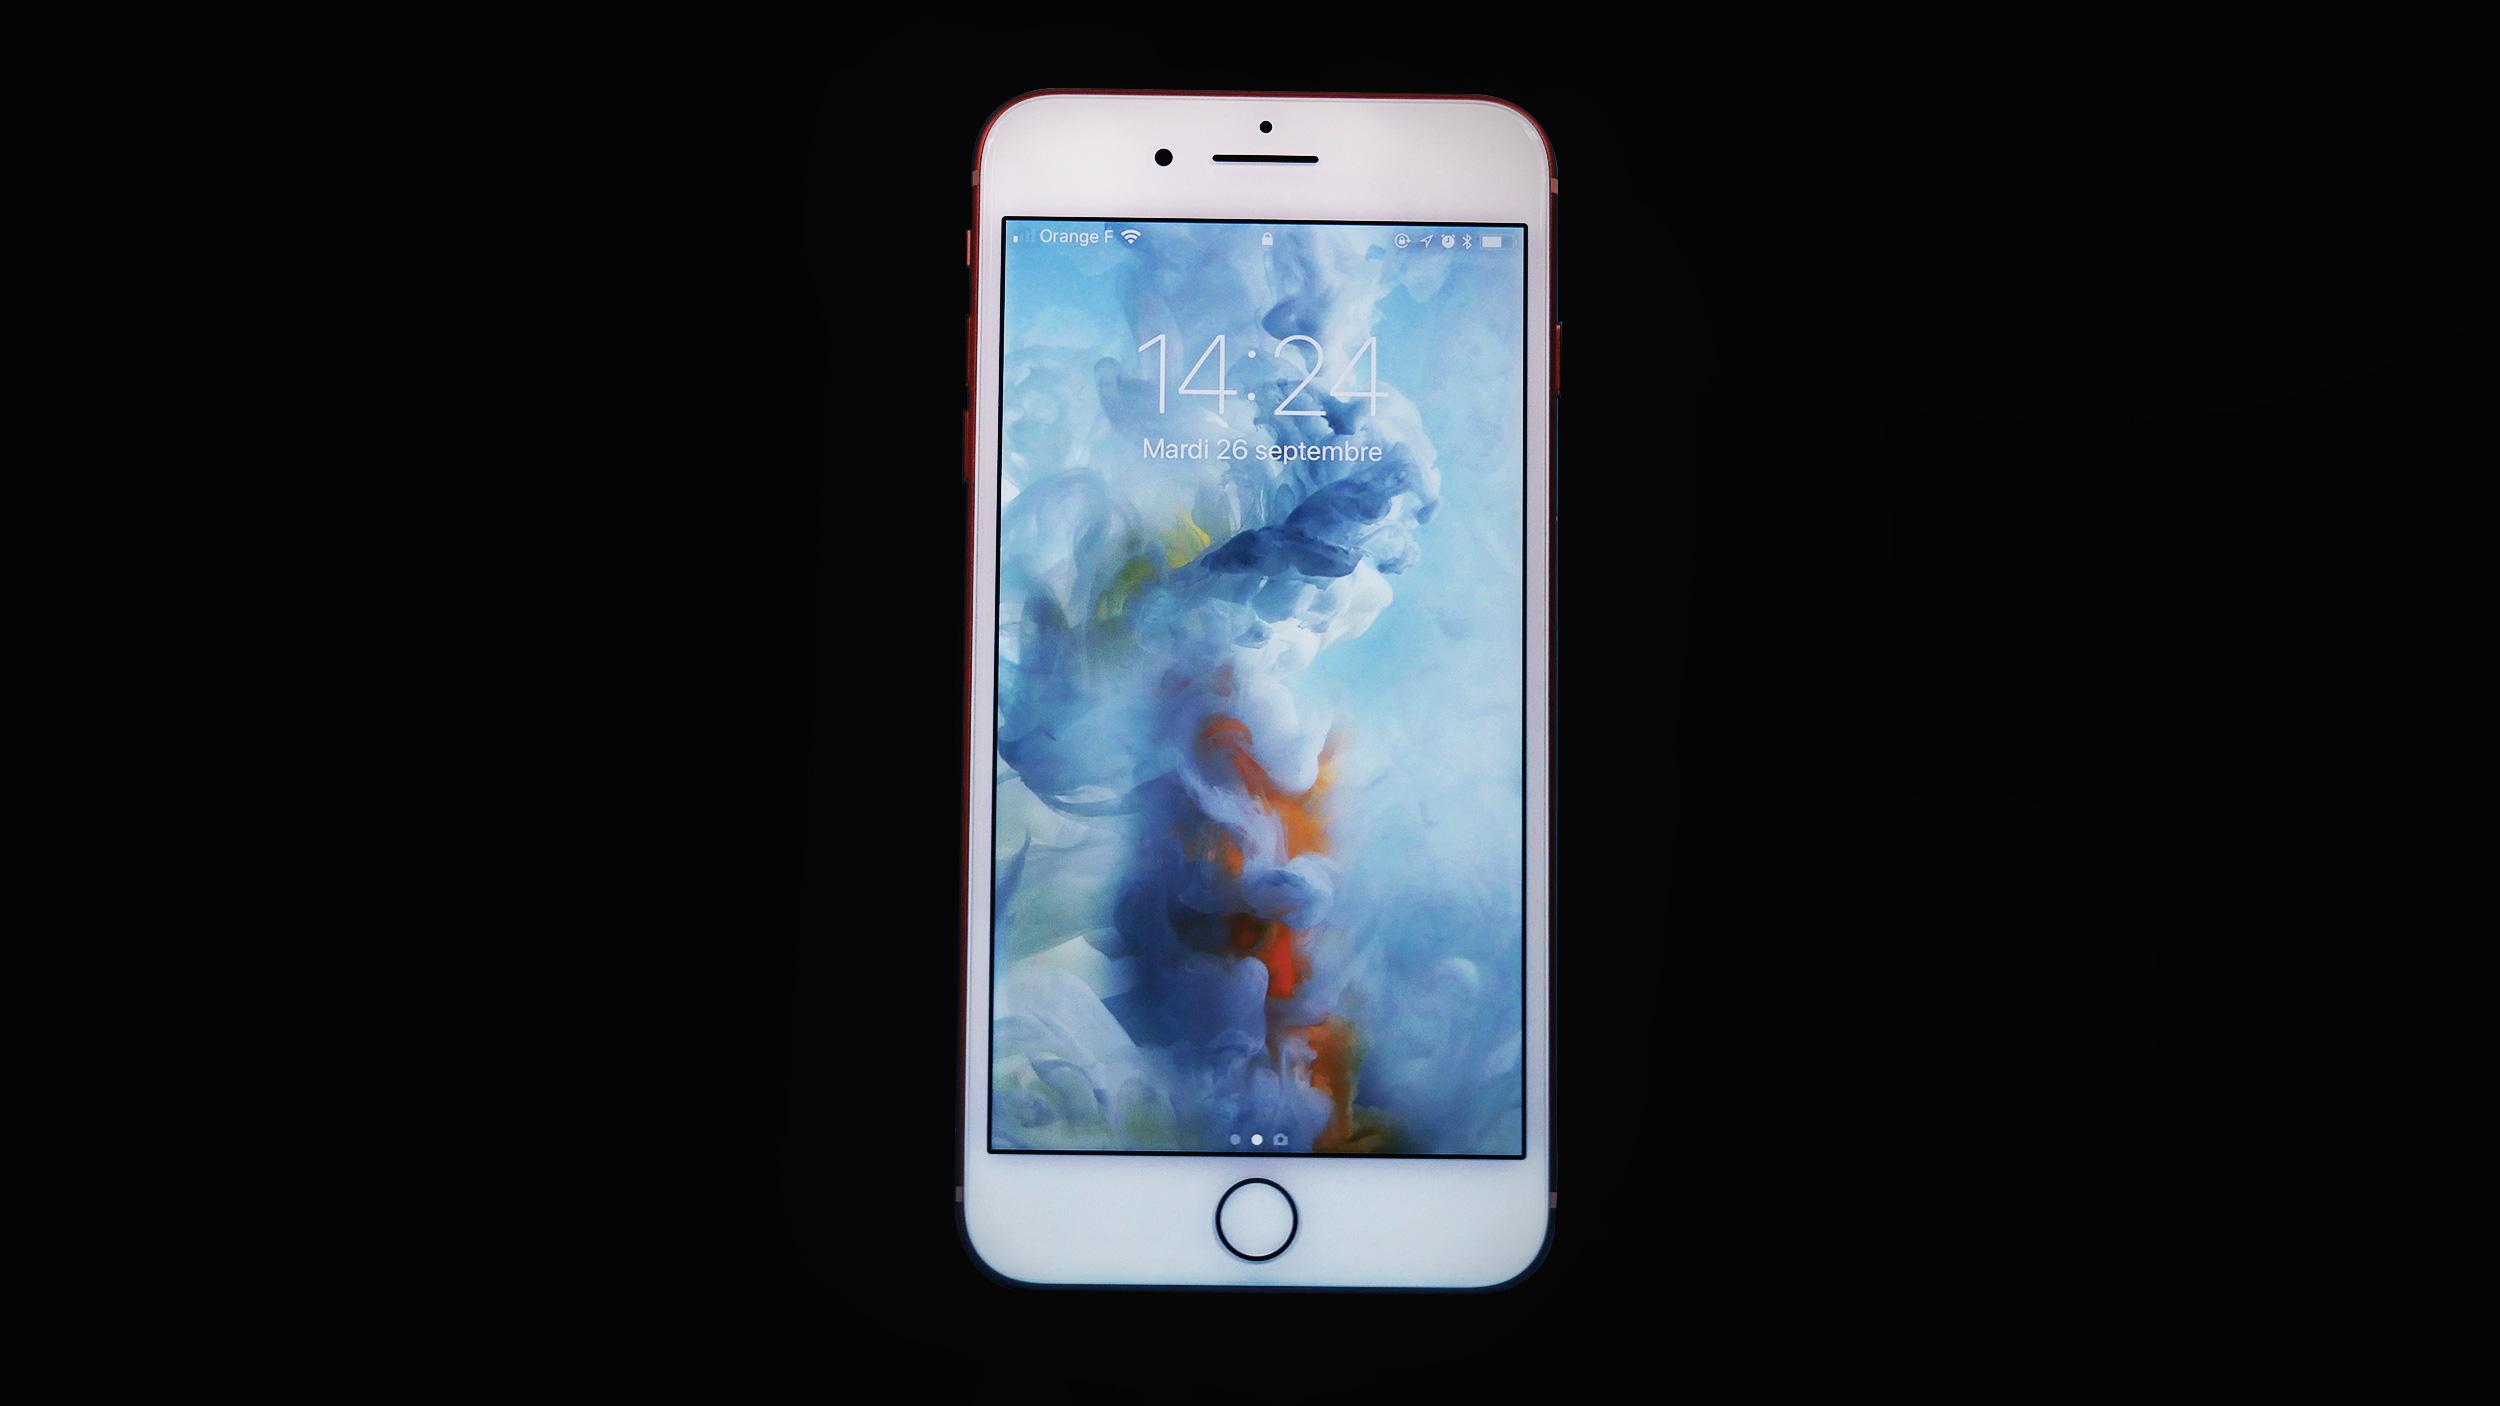 iPhone SE 2 à 399 dollars : Apple oserait-il ce tarif ?